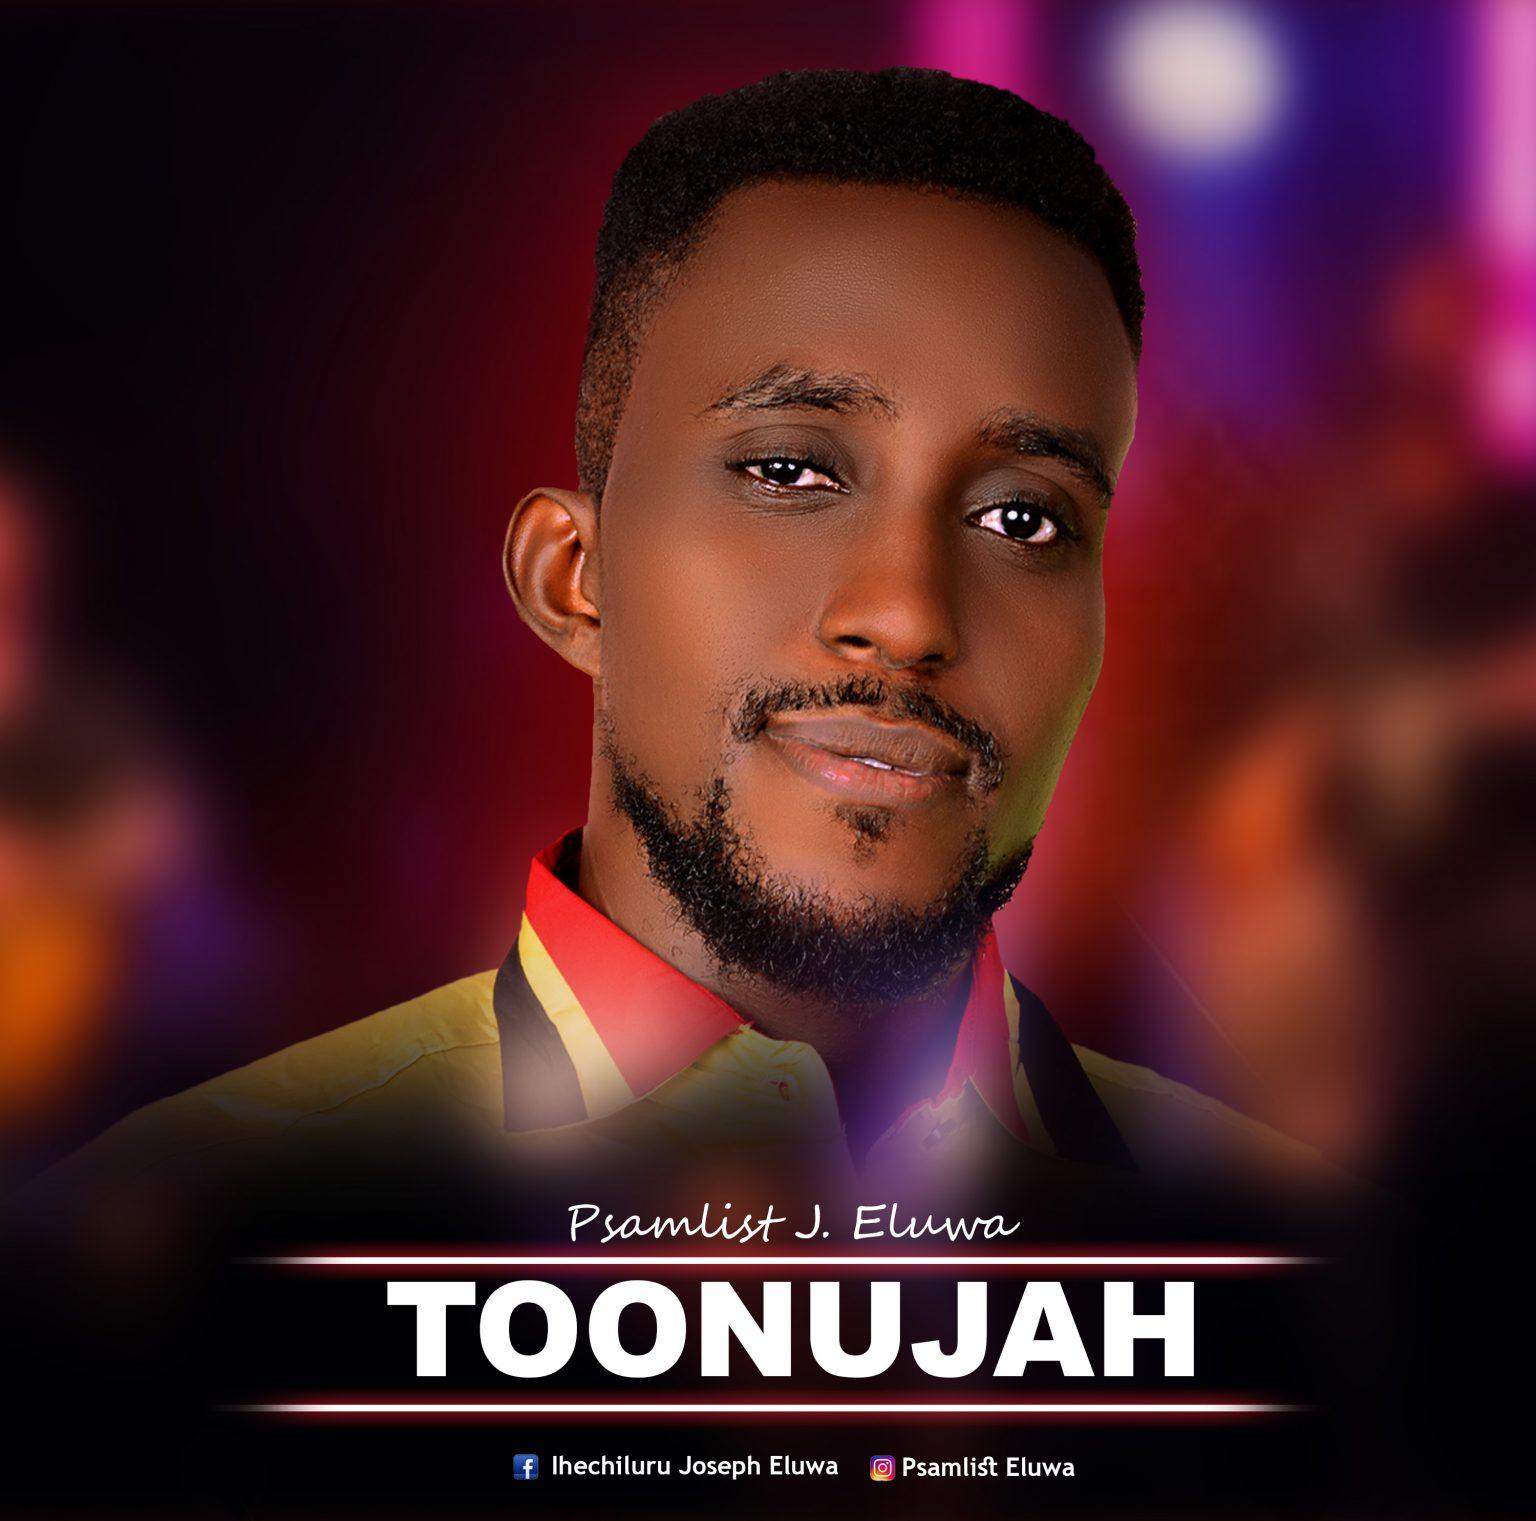 Download Mp3 Psalmist J. Eluwa - Toonujah